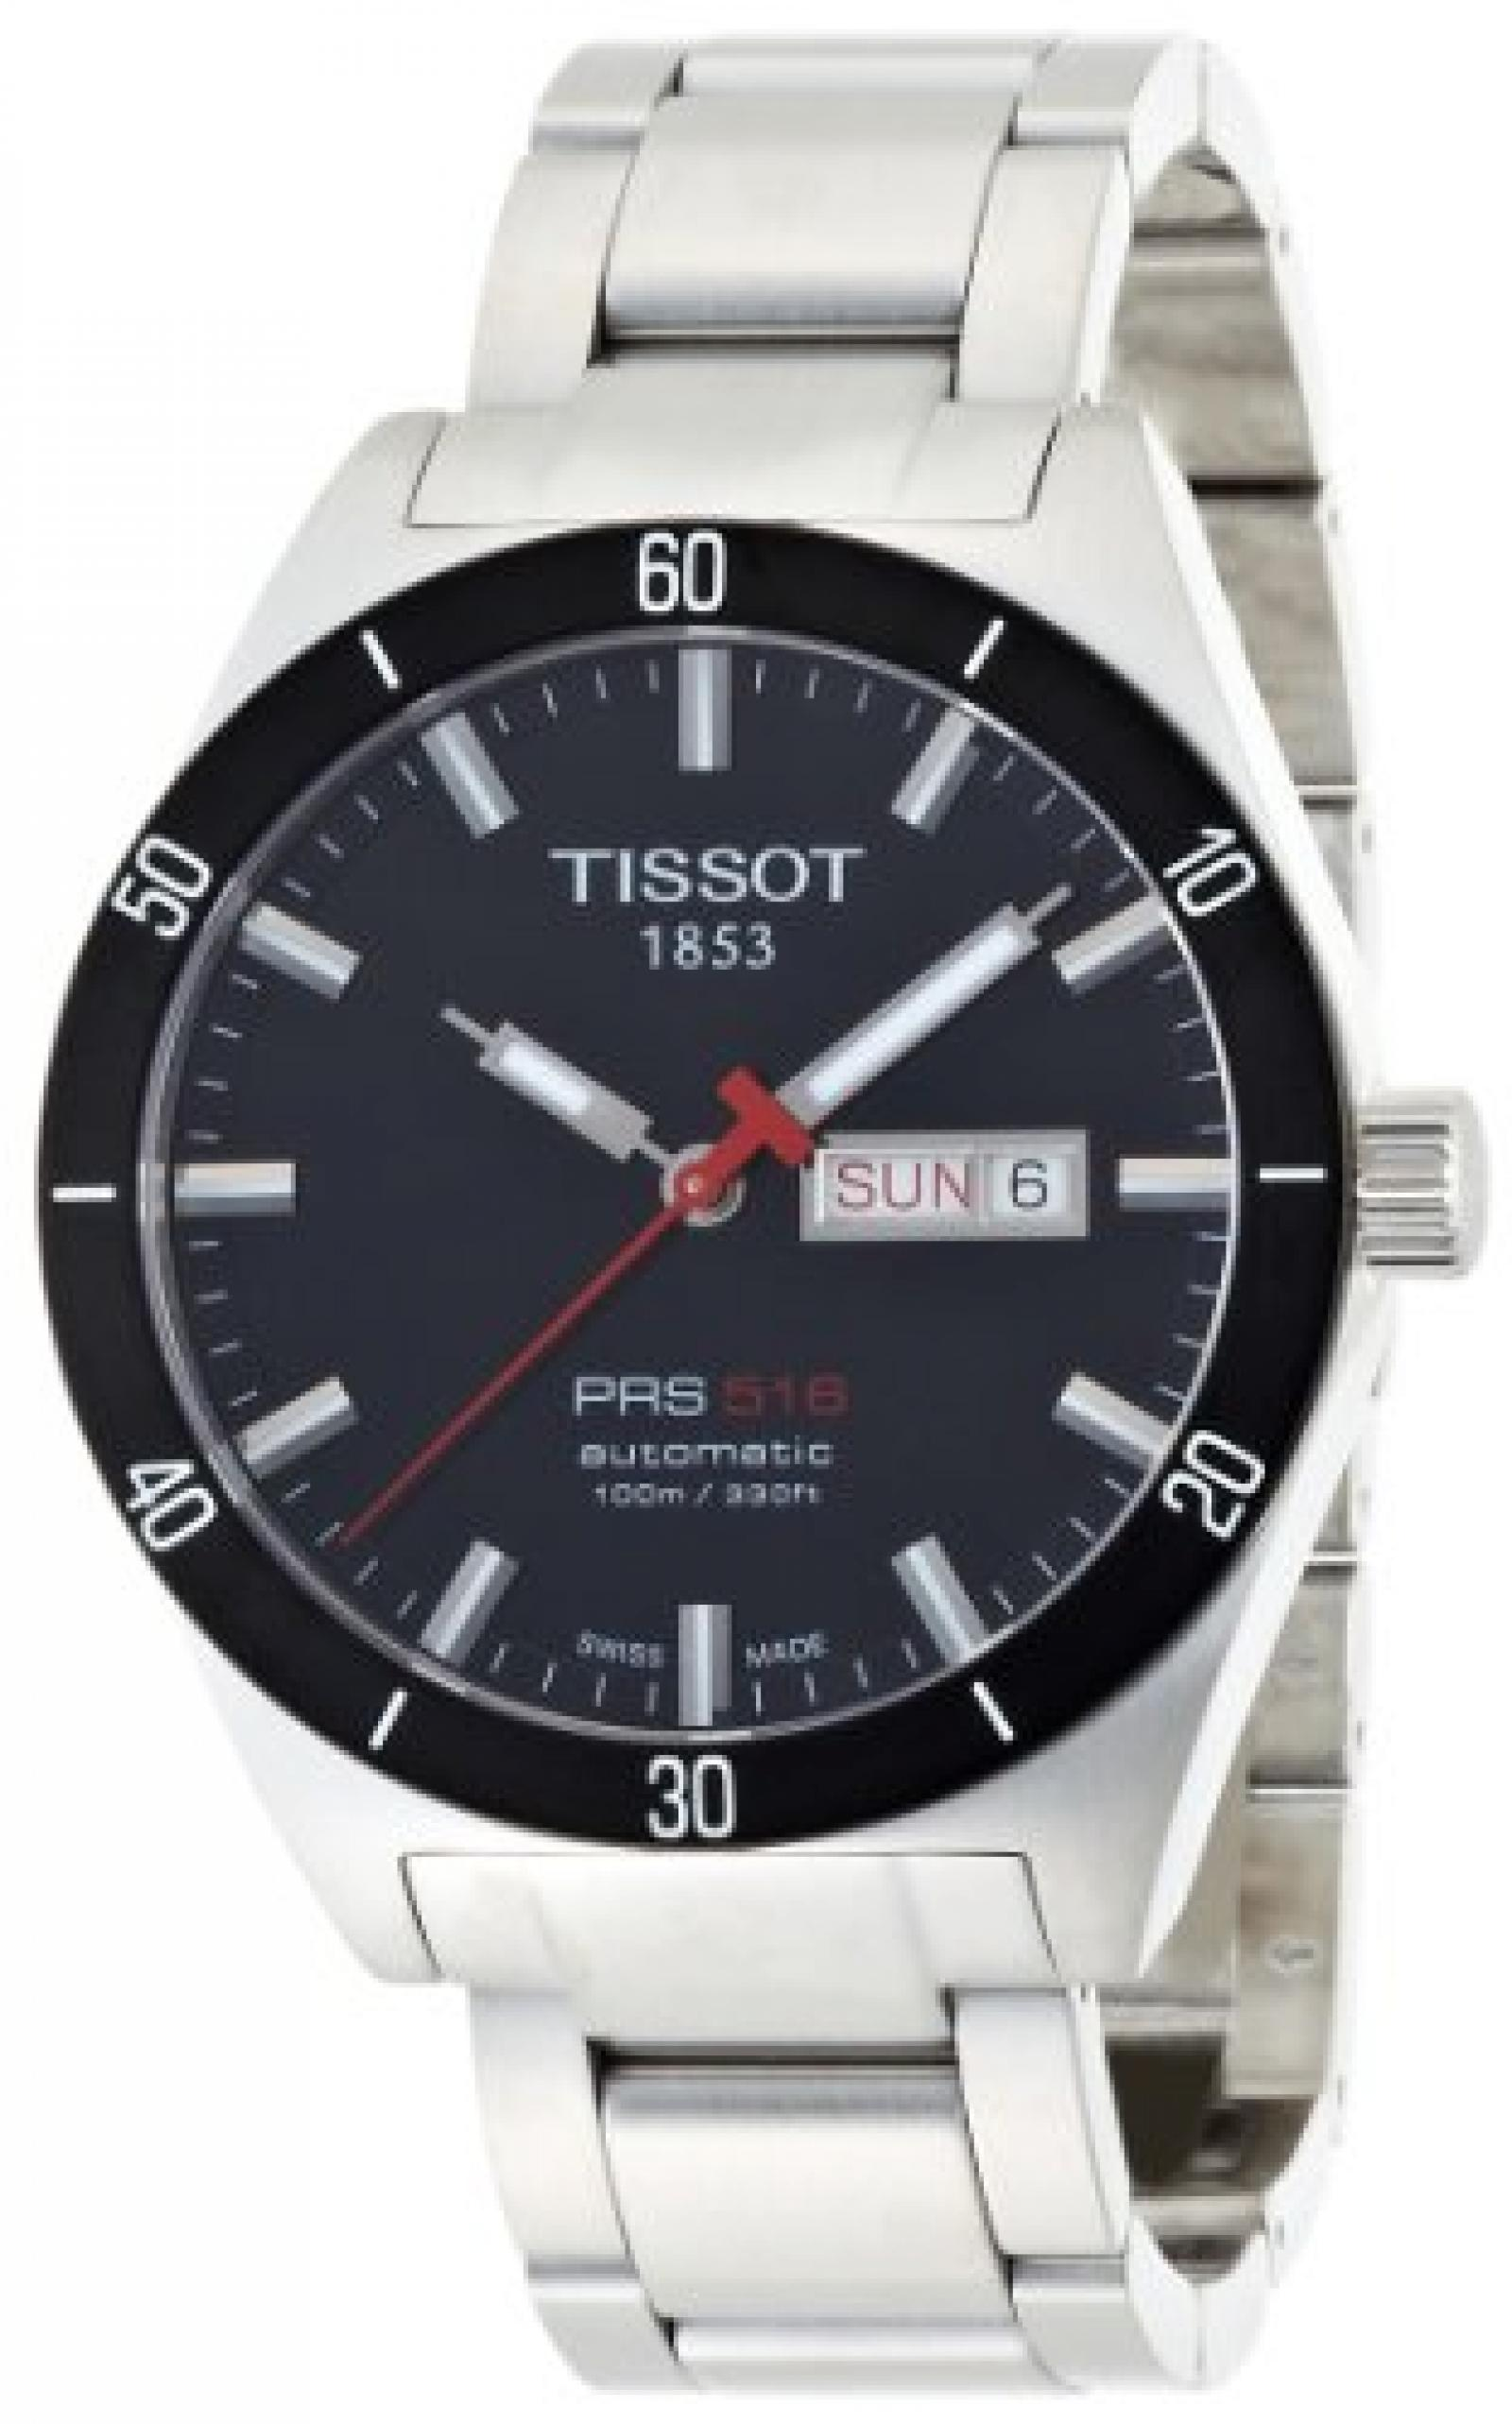 Tissot Herren-Armbanduhr PRS516 T0444302105100